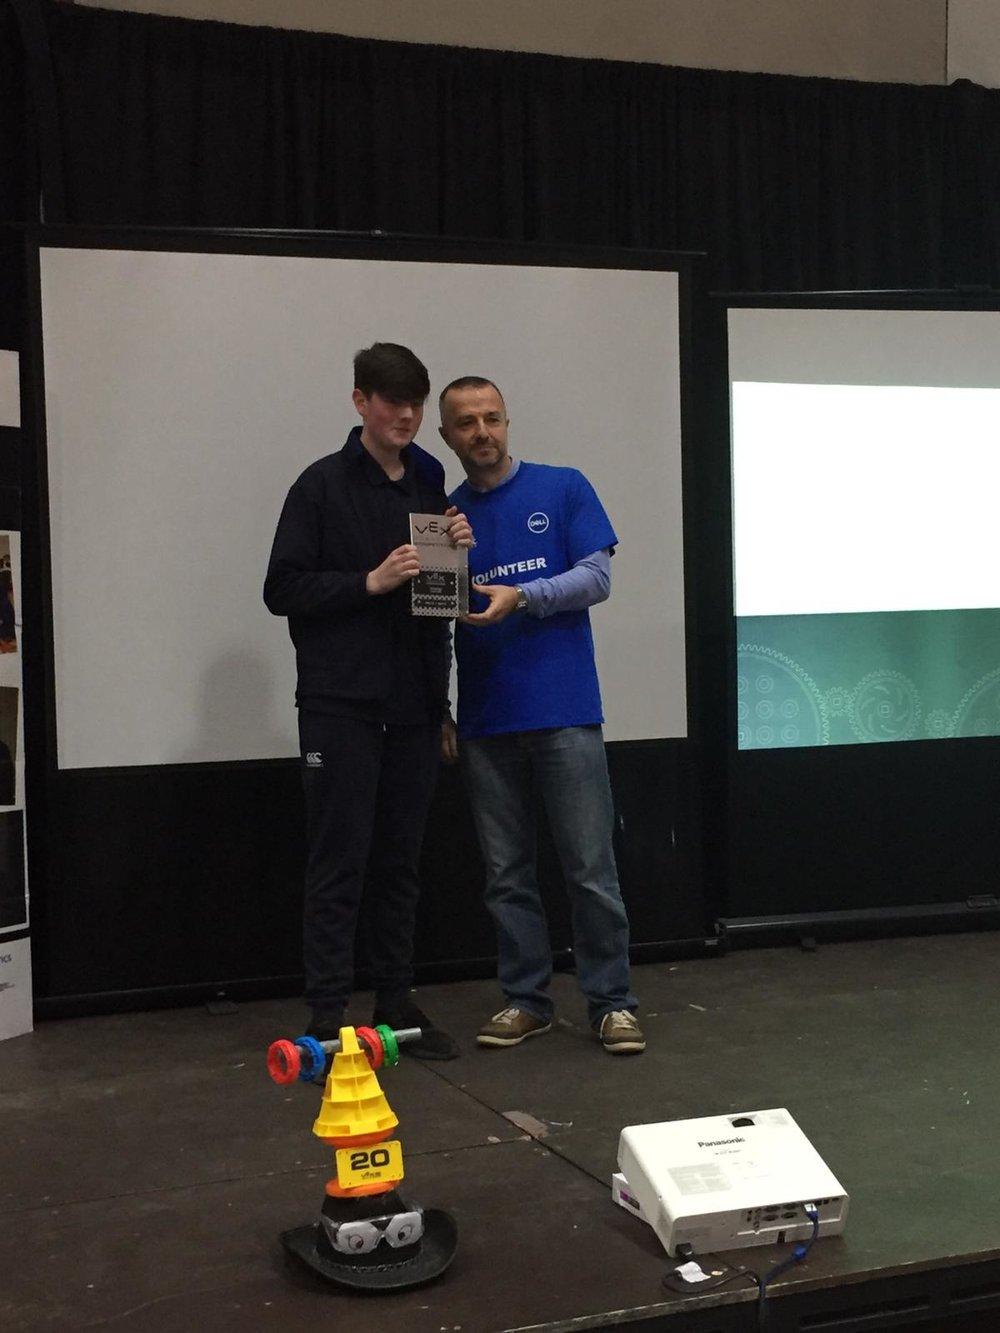 Conor Gaffney & VEX Robotics Representative.jpg